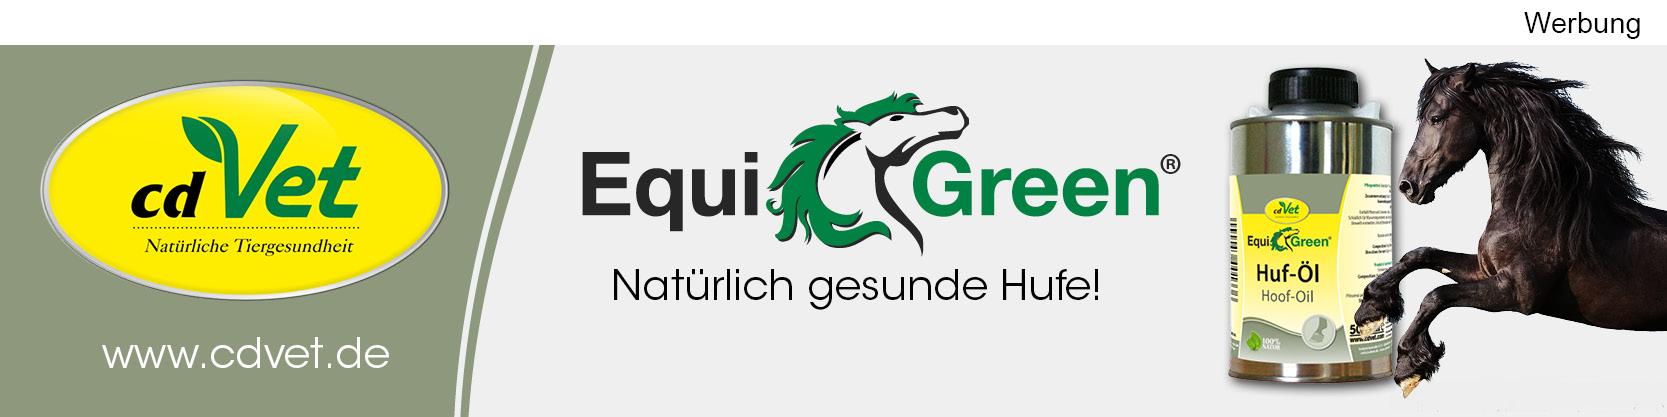 Werbung Equigreen Huföl